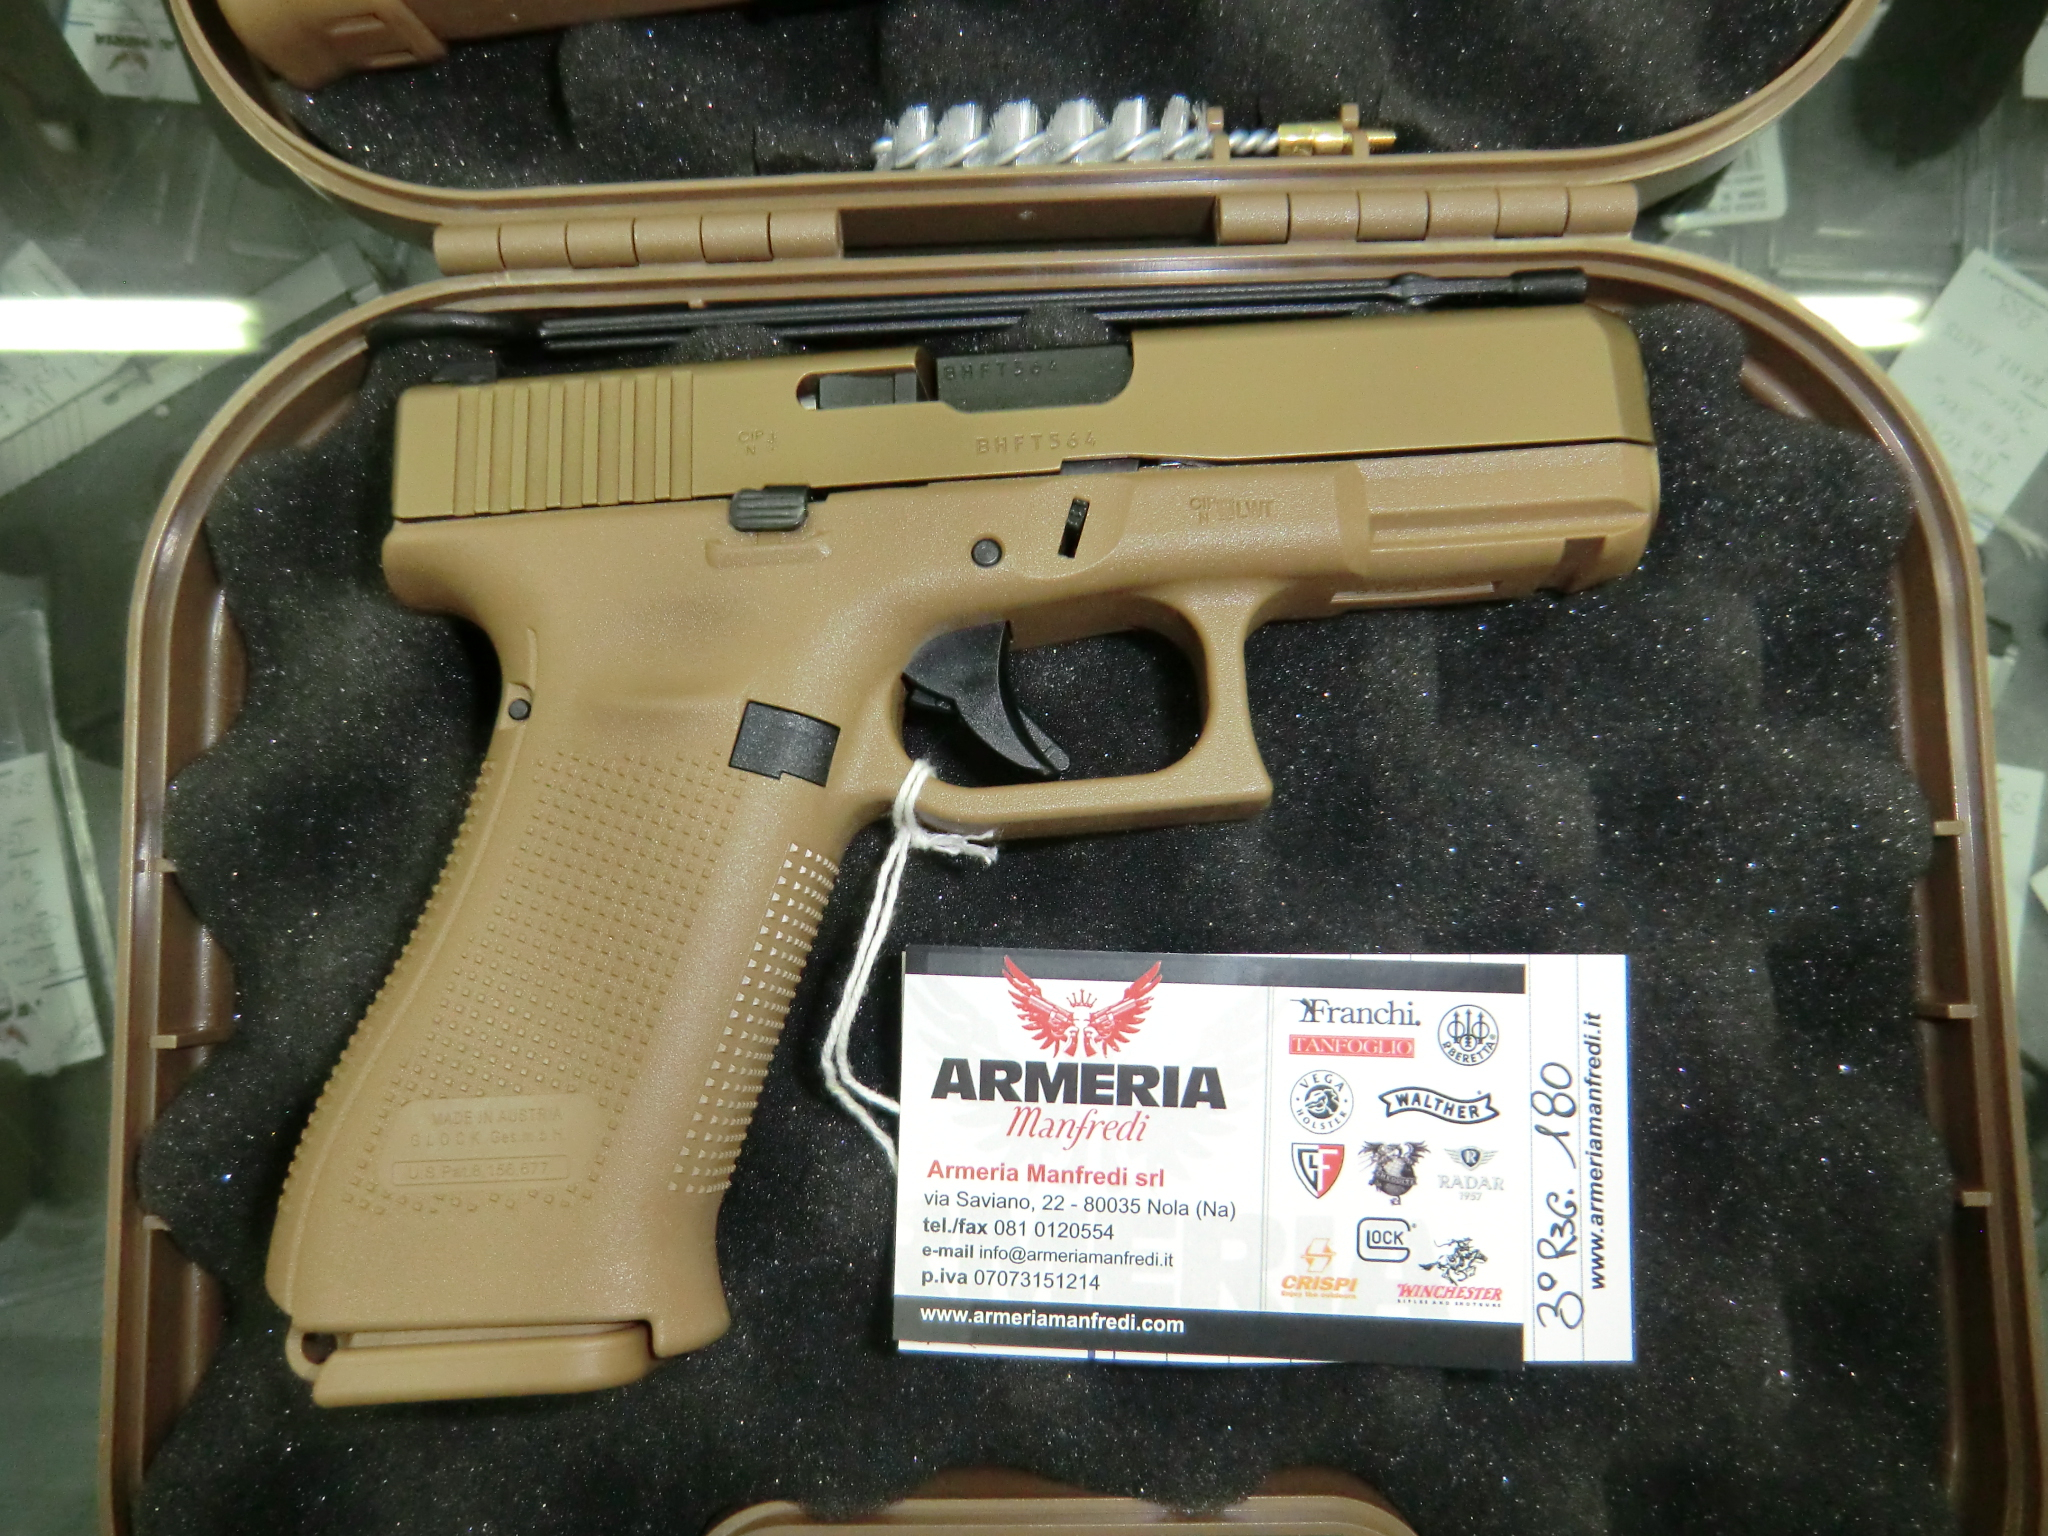 Glock modello 19 X FDE SPORT calibro 9×21